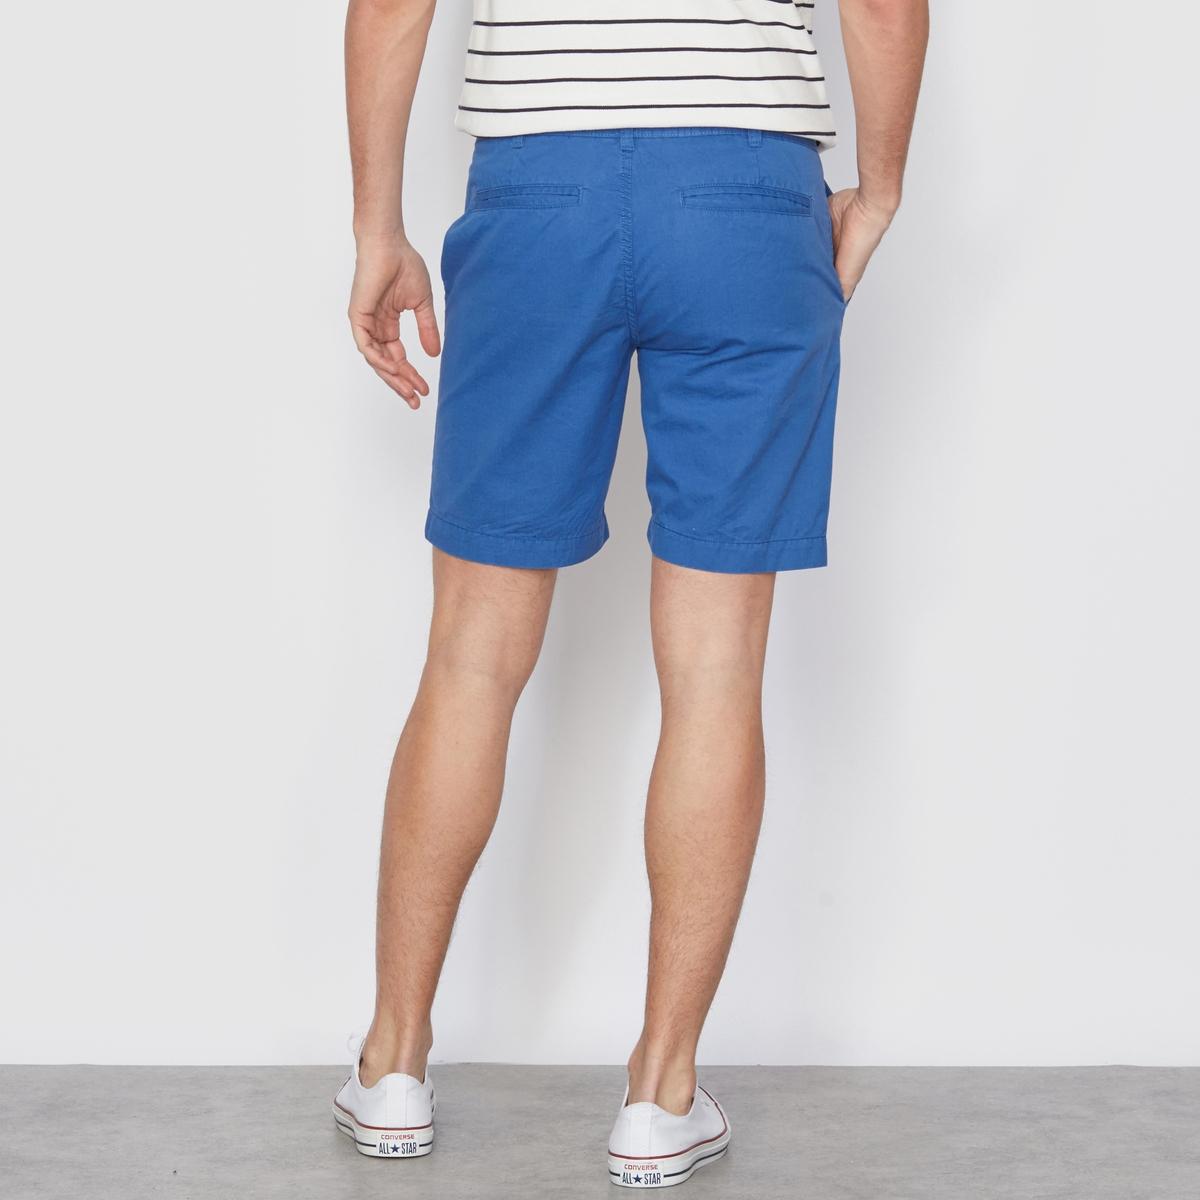 R Essentiel Mens Coloured Chino Style Bermuda Shorts   eBay